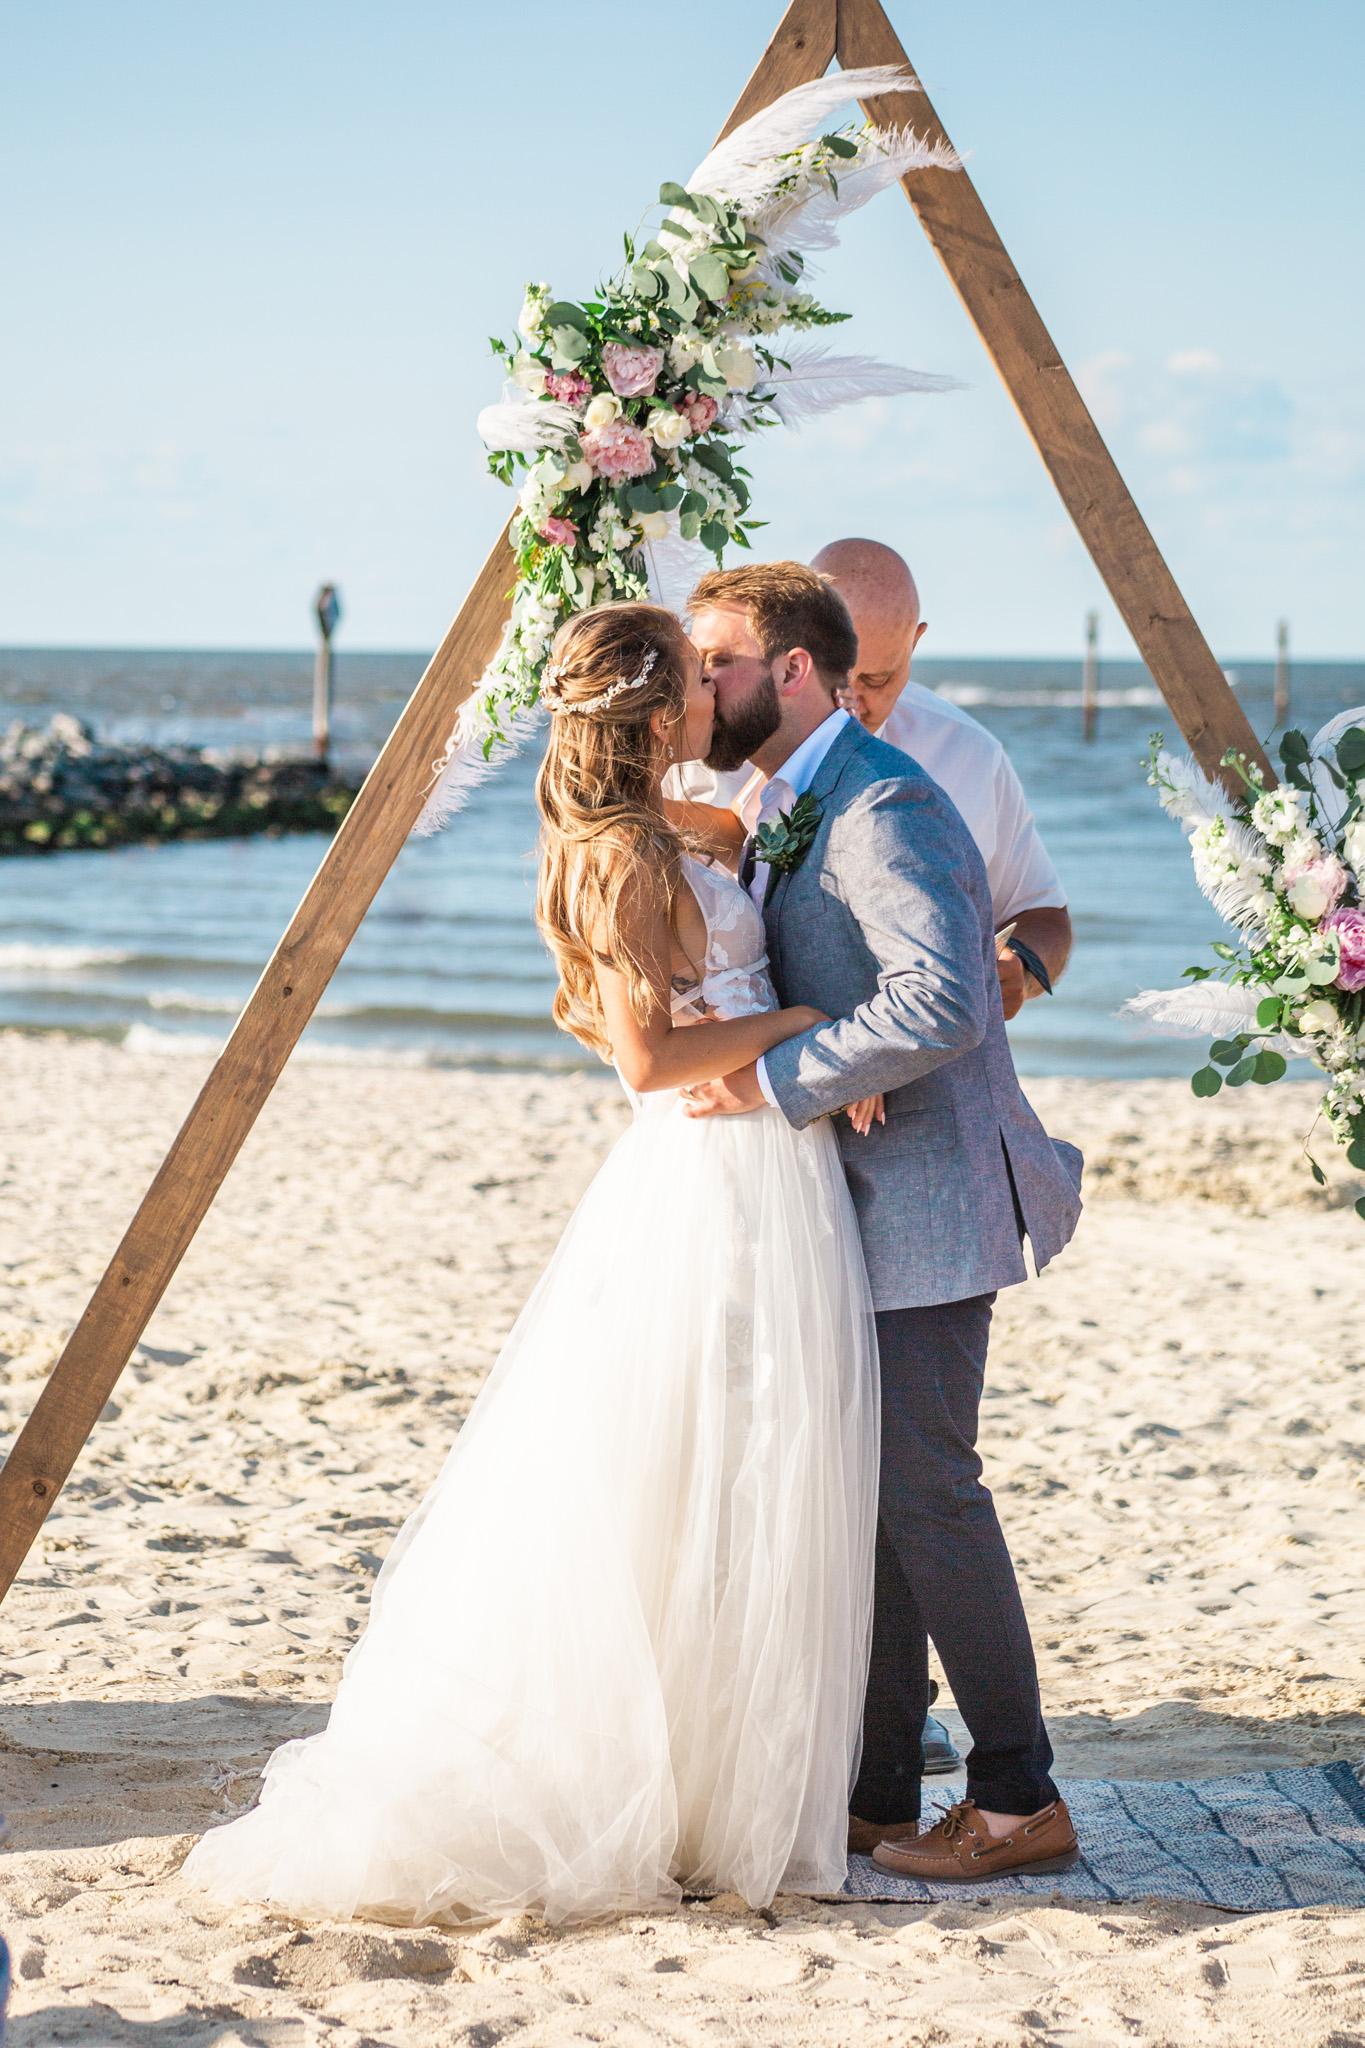 SheenaPendleydp.com-delaware-beach-wedding-photographer-4741.jpg